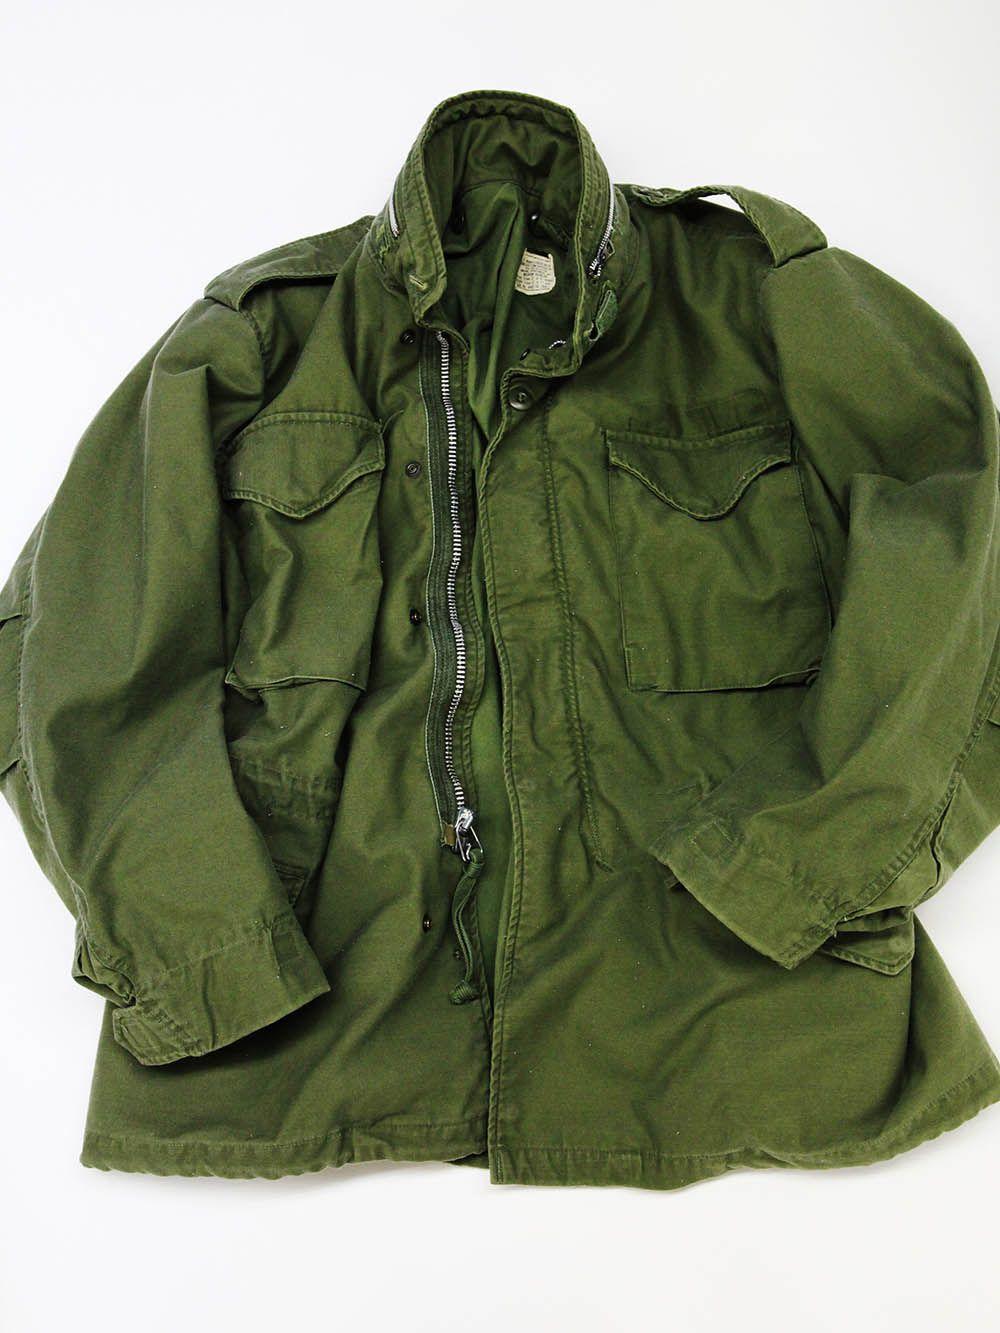 Полево яке М-65 M65 Jacket 67e164483